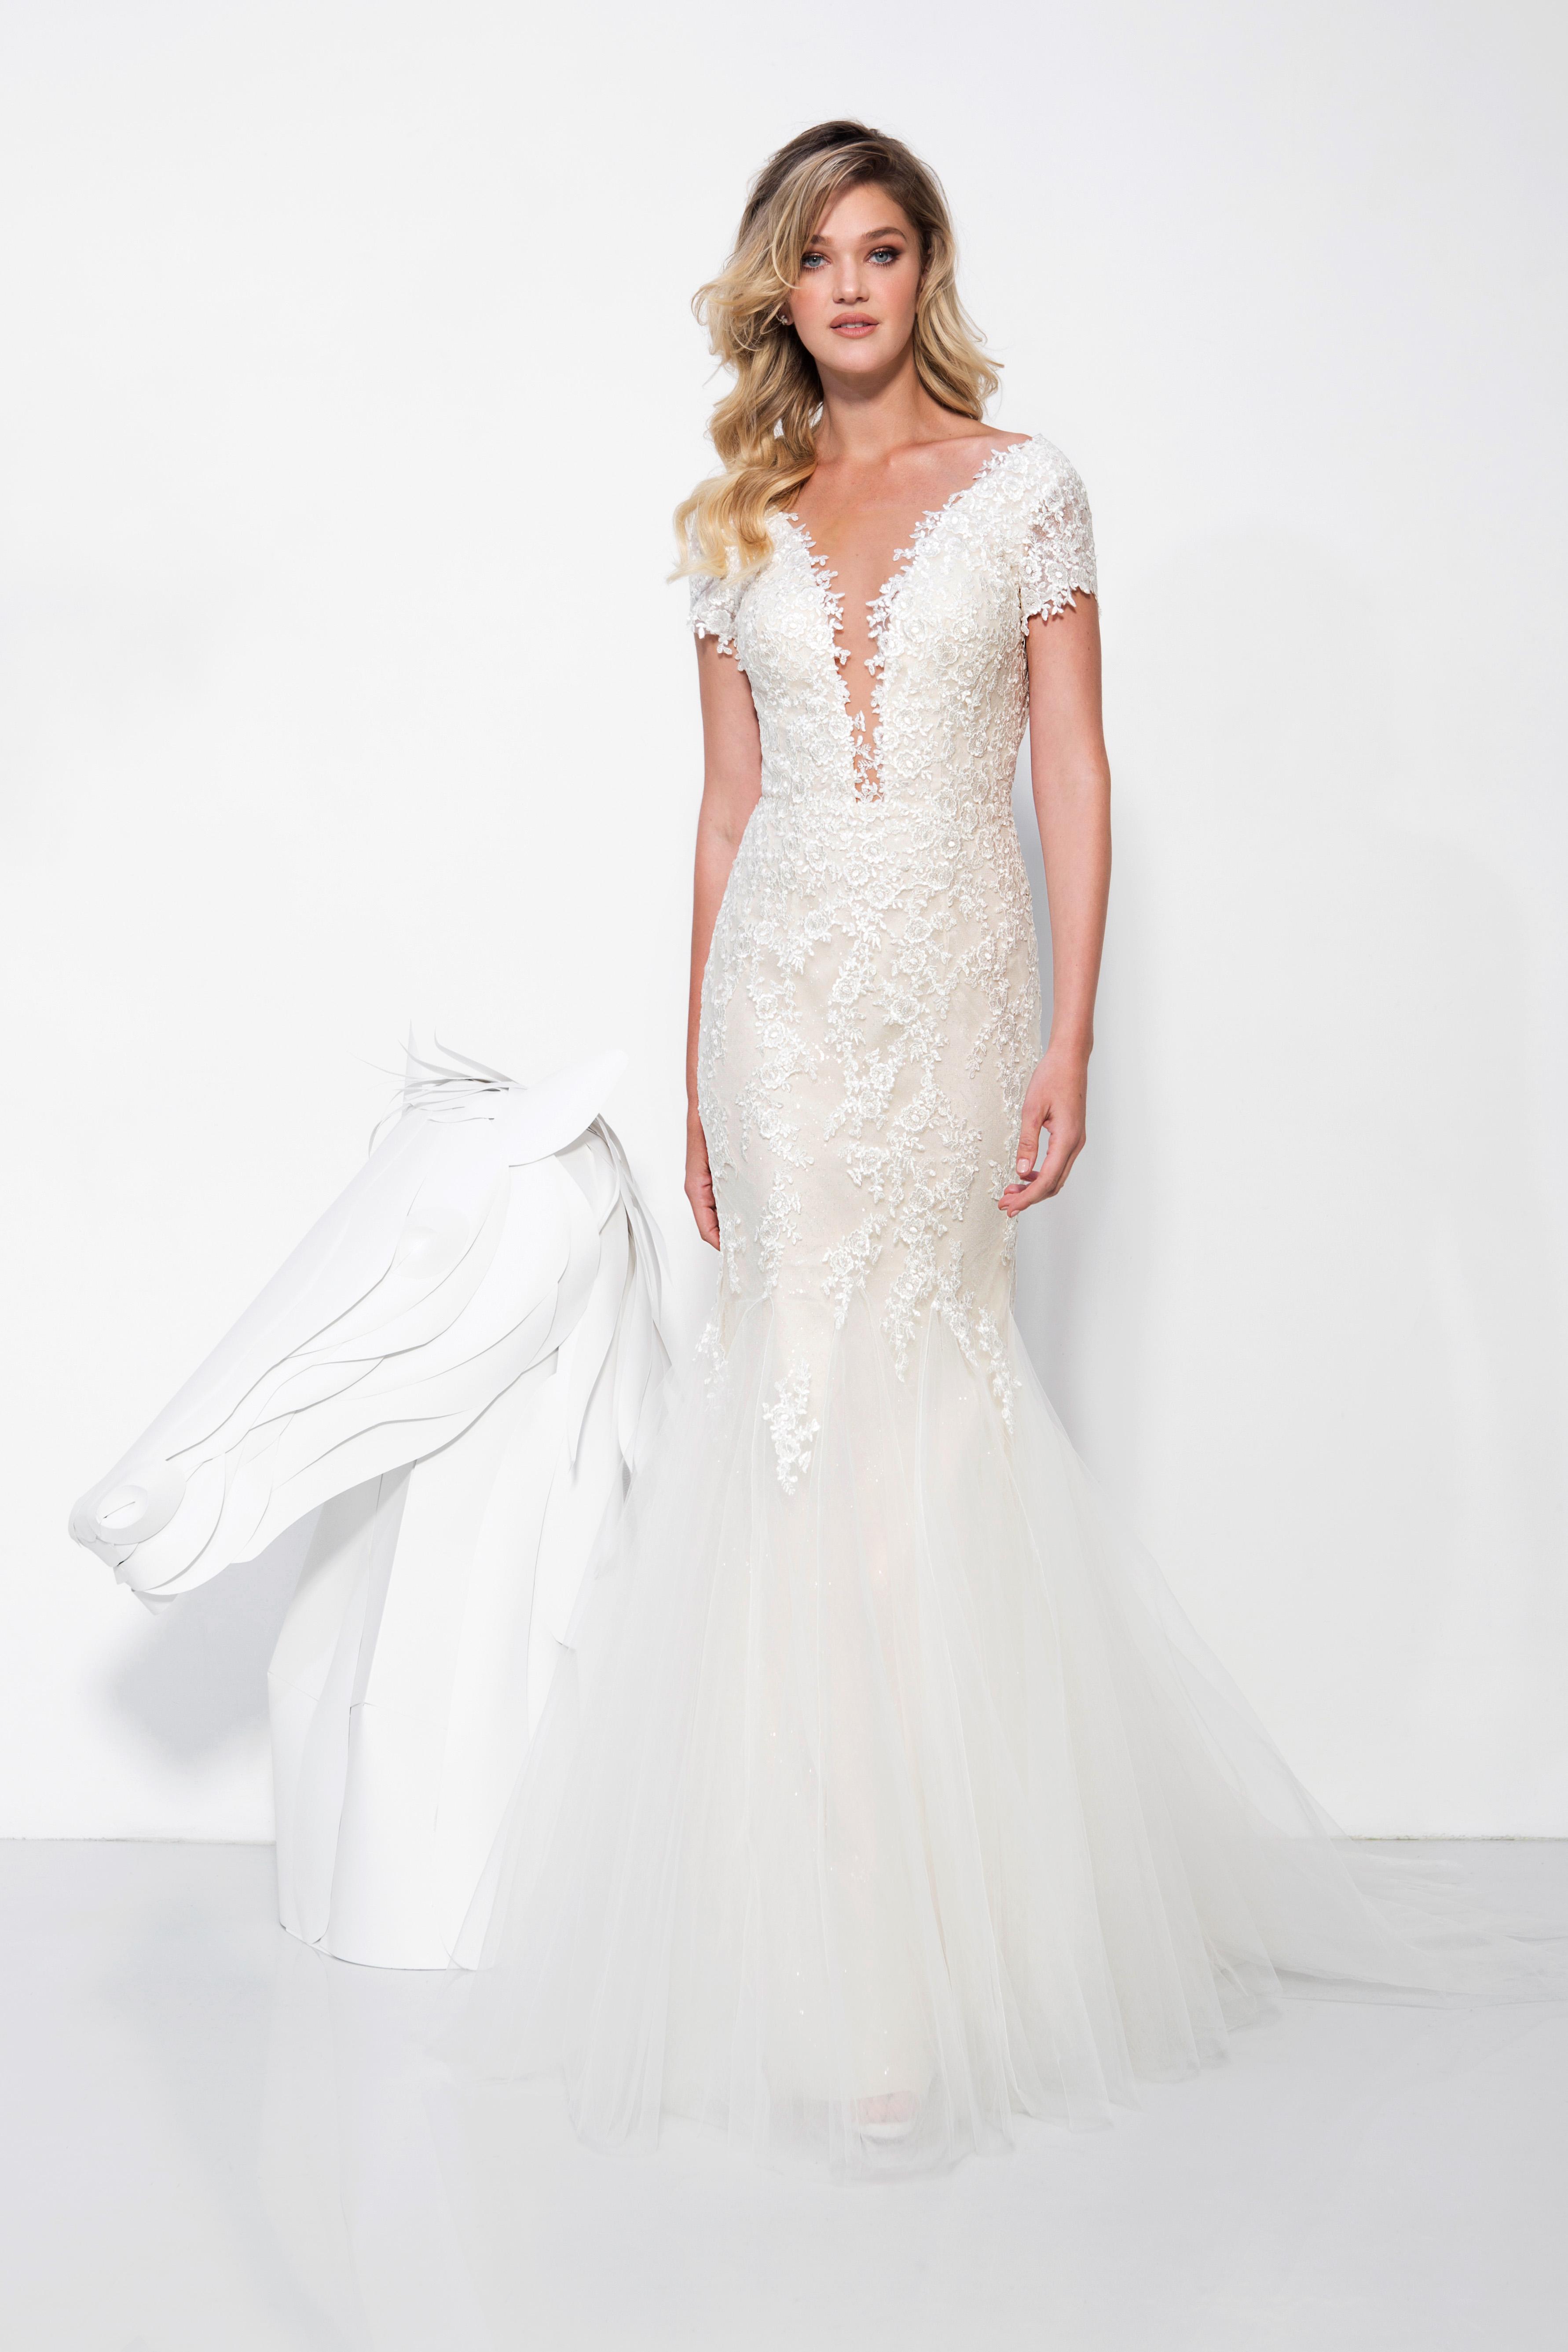 lavish by yaniv persy wedding dress spring 2019 short sleeves lace trumpet